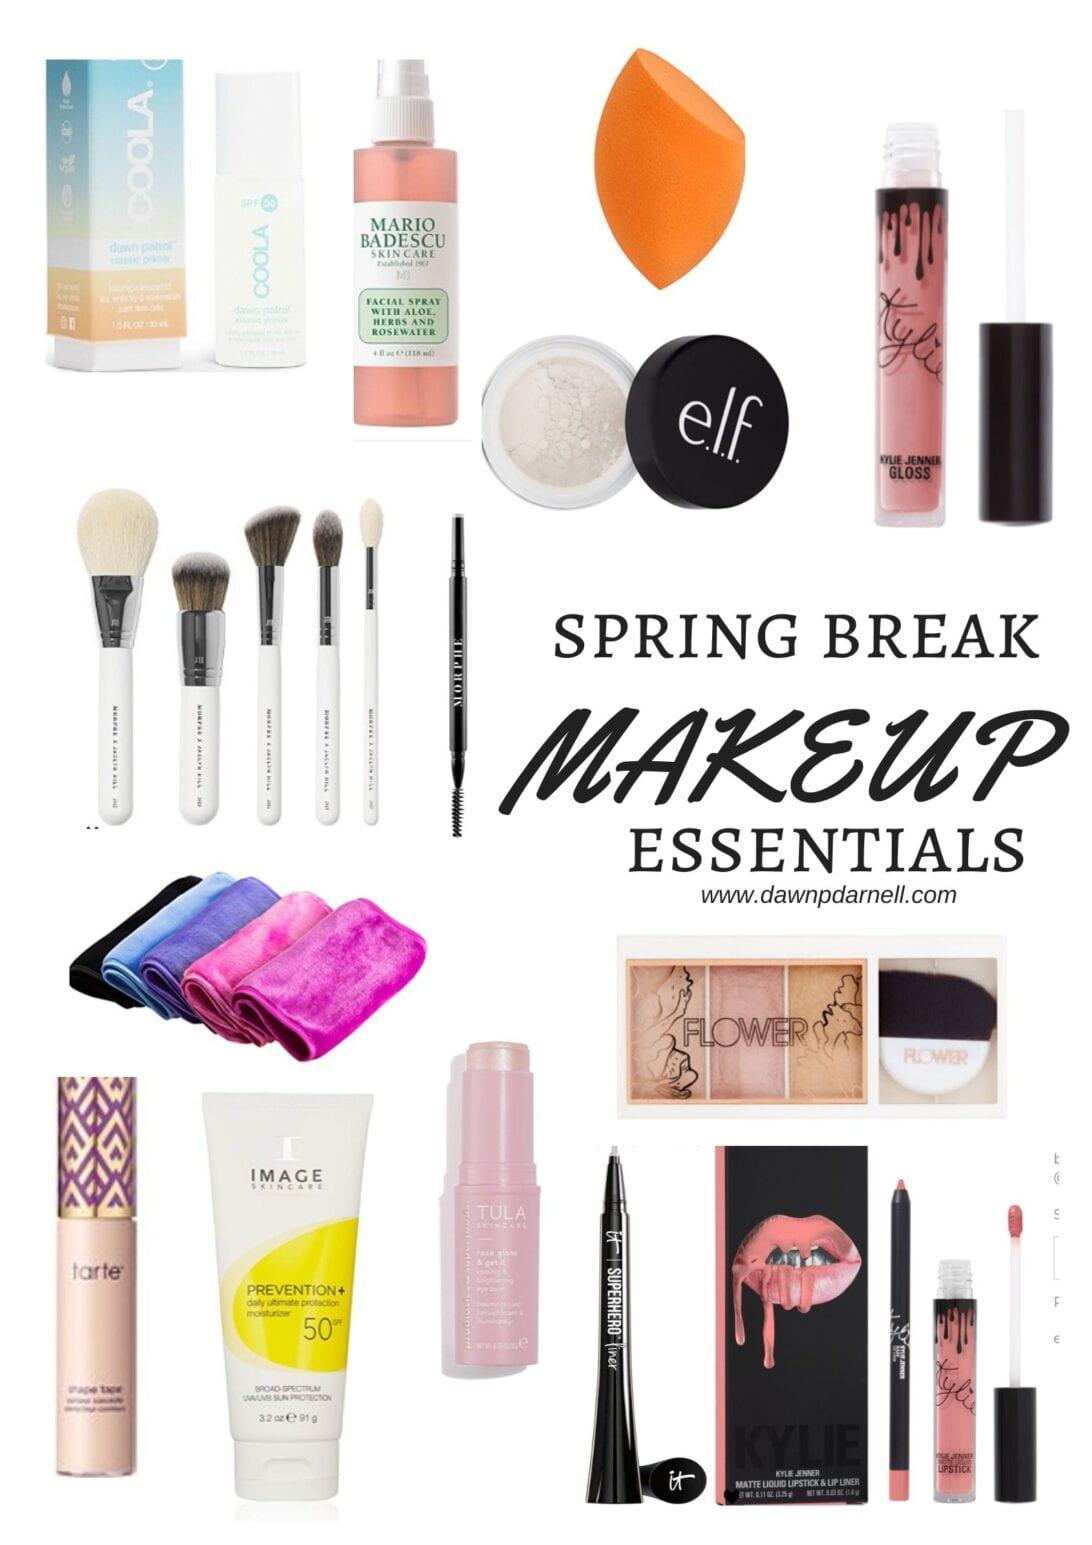 makeup essentials, everyday essentials, Kylie ip kit, tart shape tape, flower beauty, elf beauty, elf cosmetics